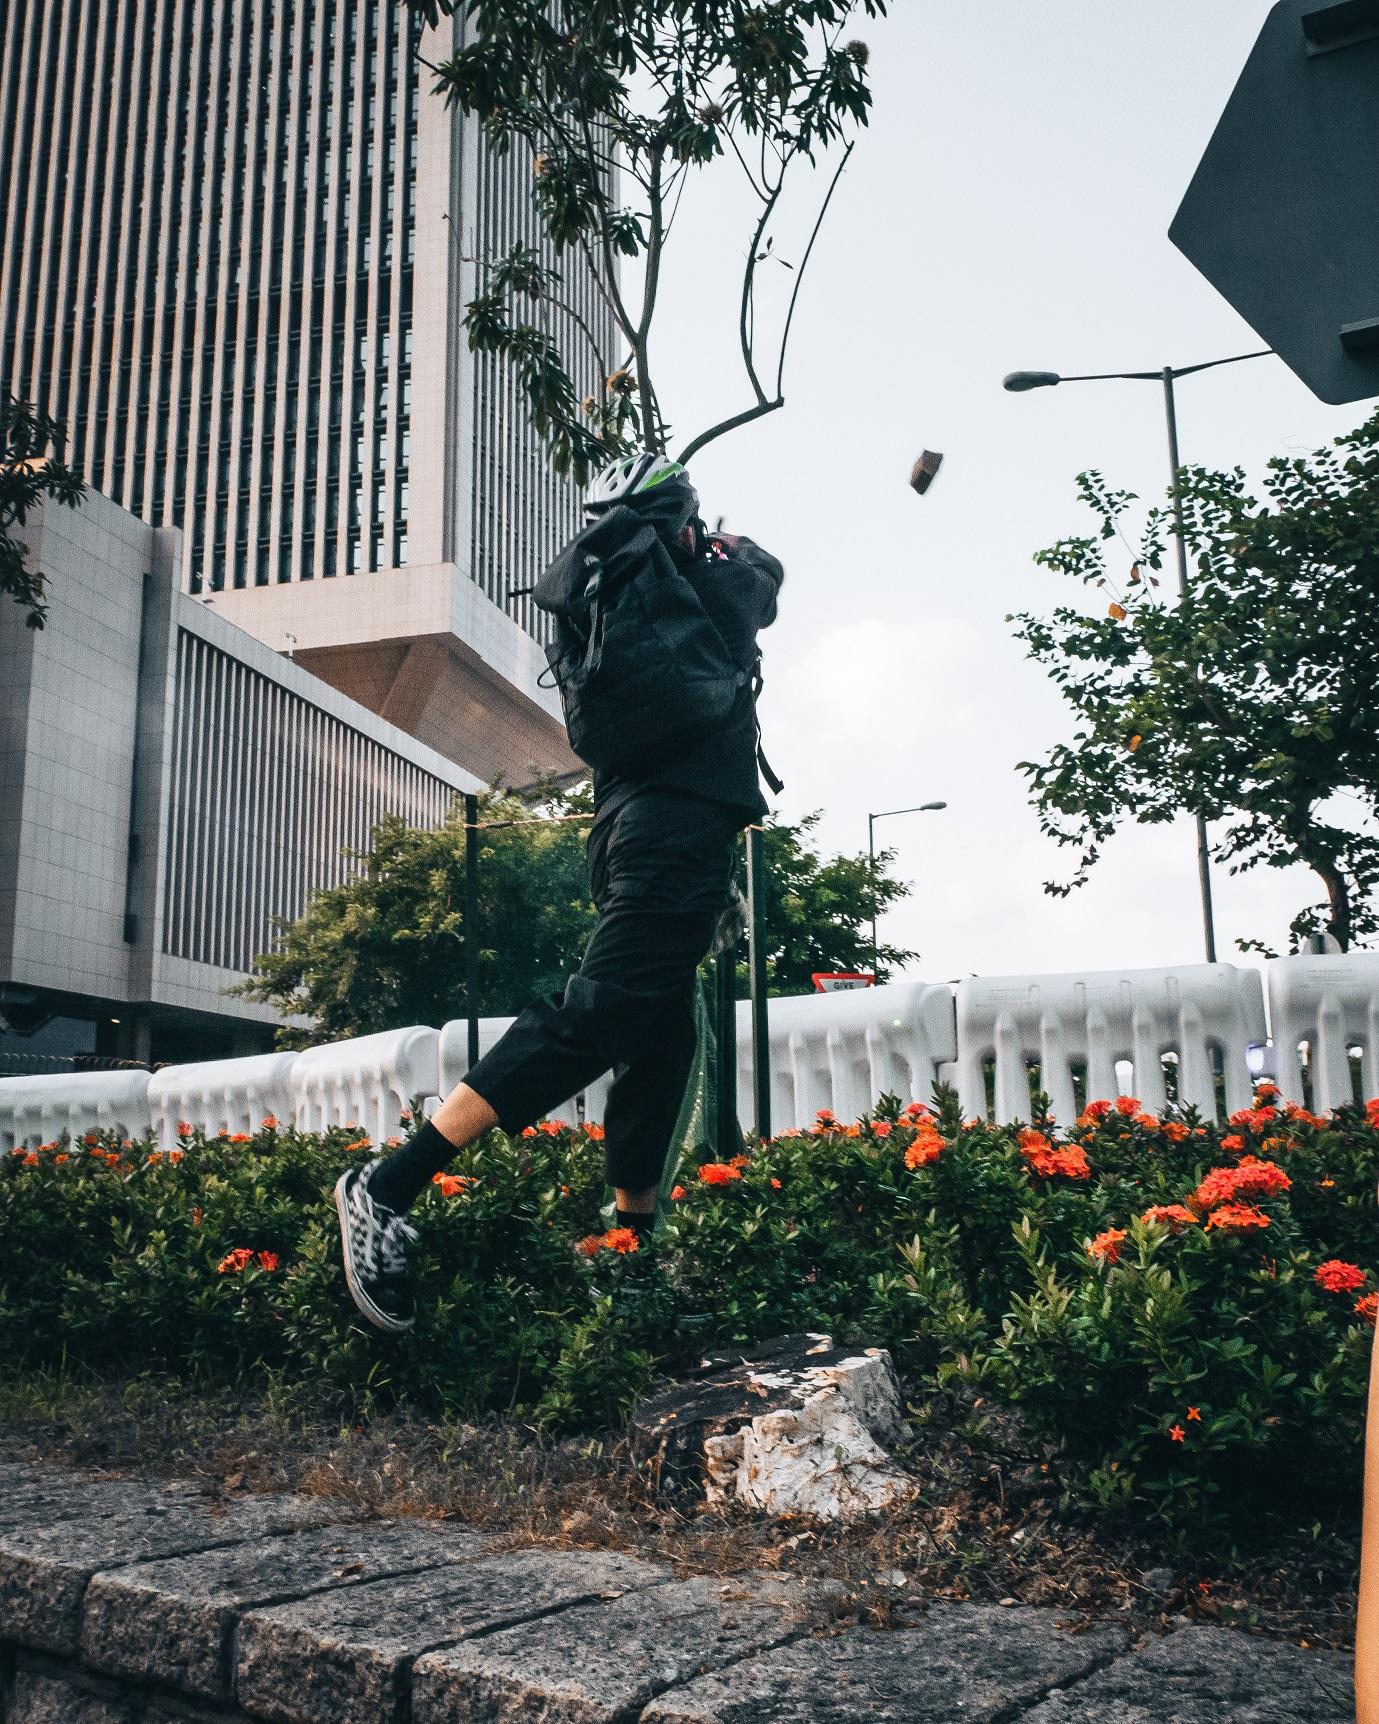 Protester throwing bricks at government building in Hong Kong